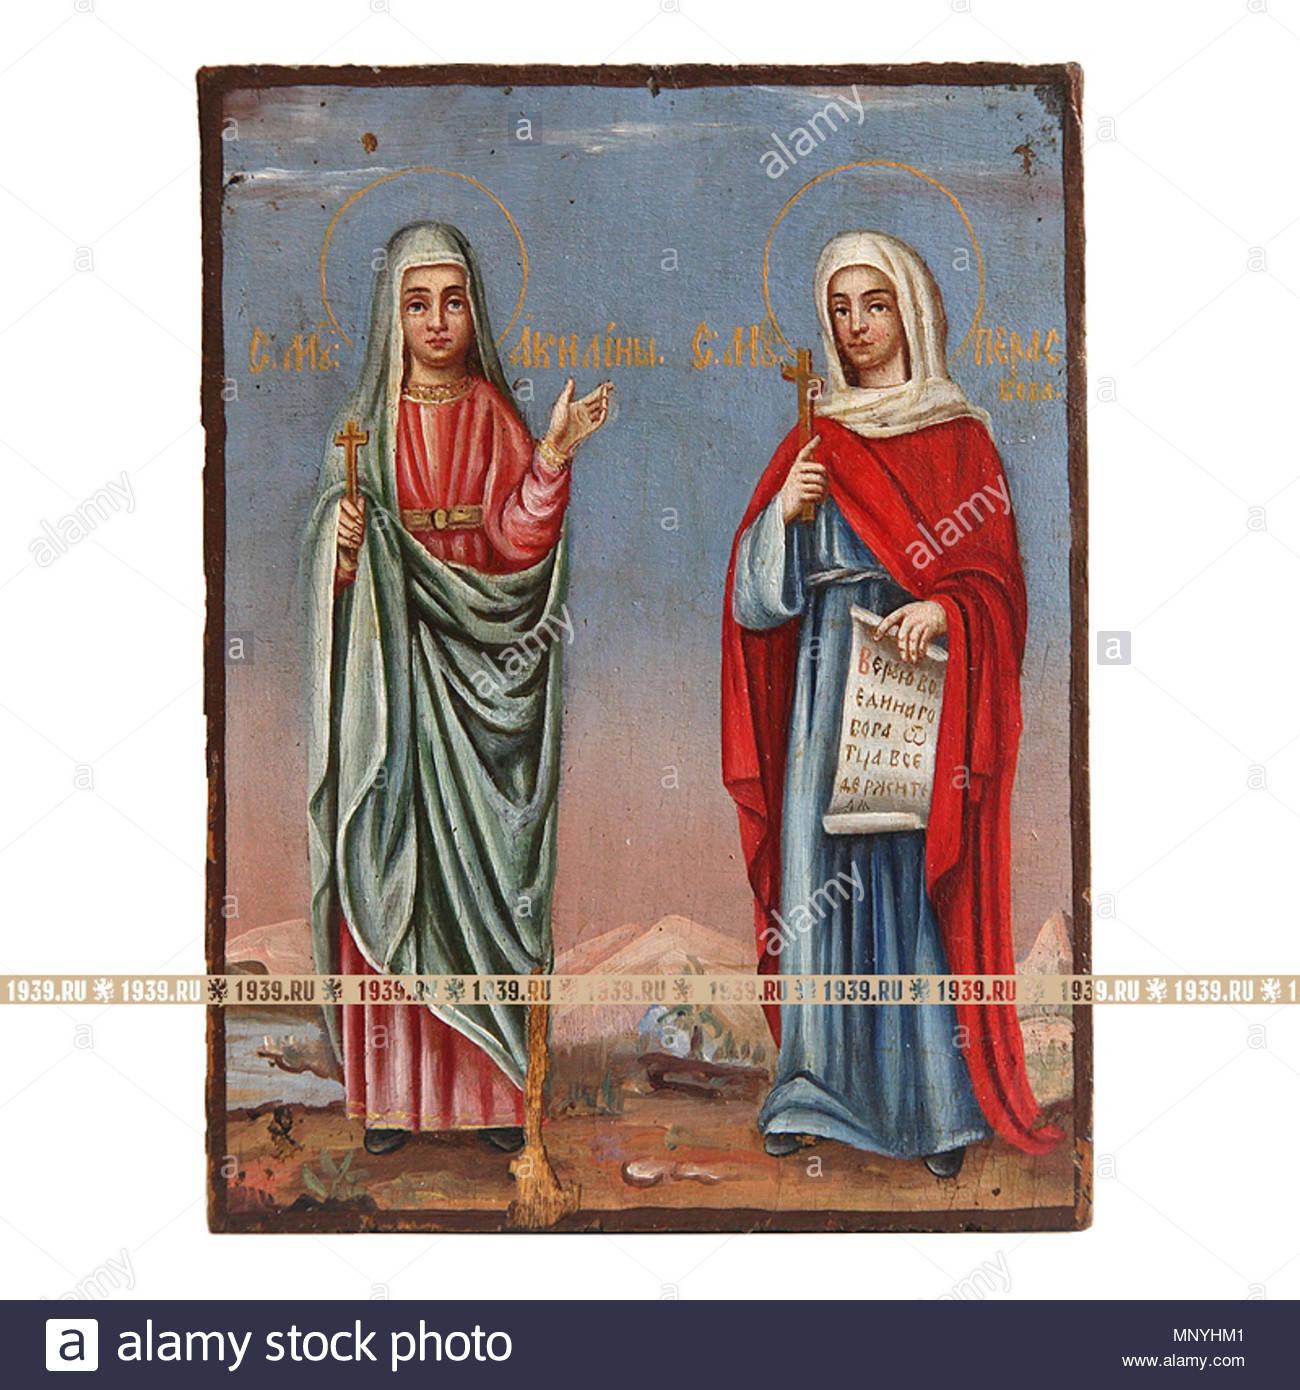 1292 Акилина Библосская и Параскева Пятница